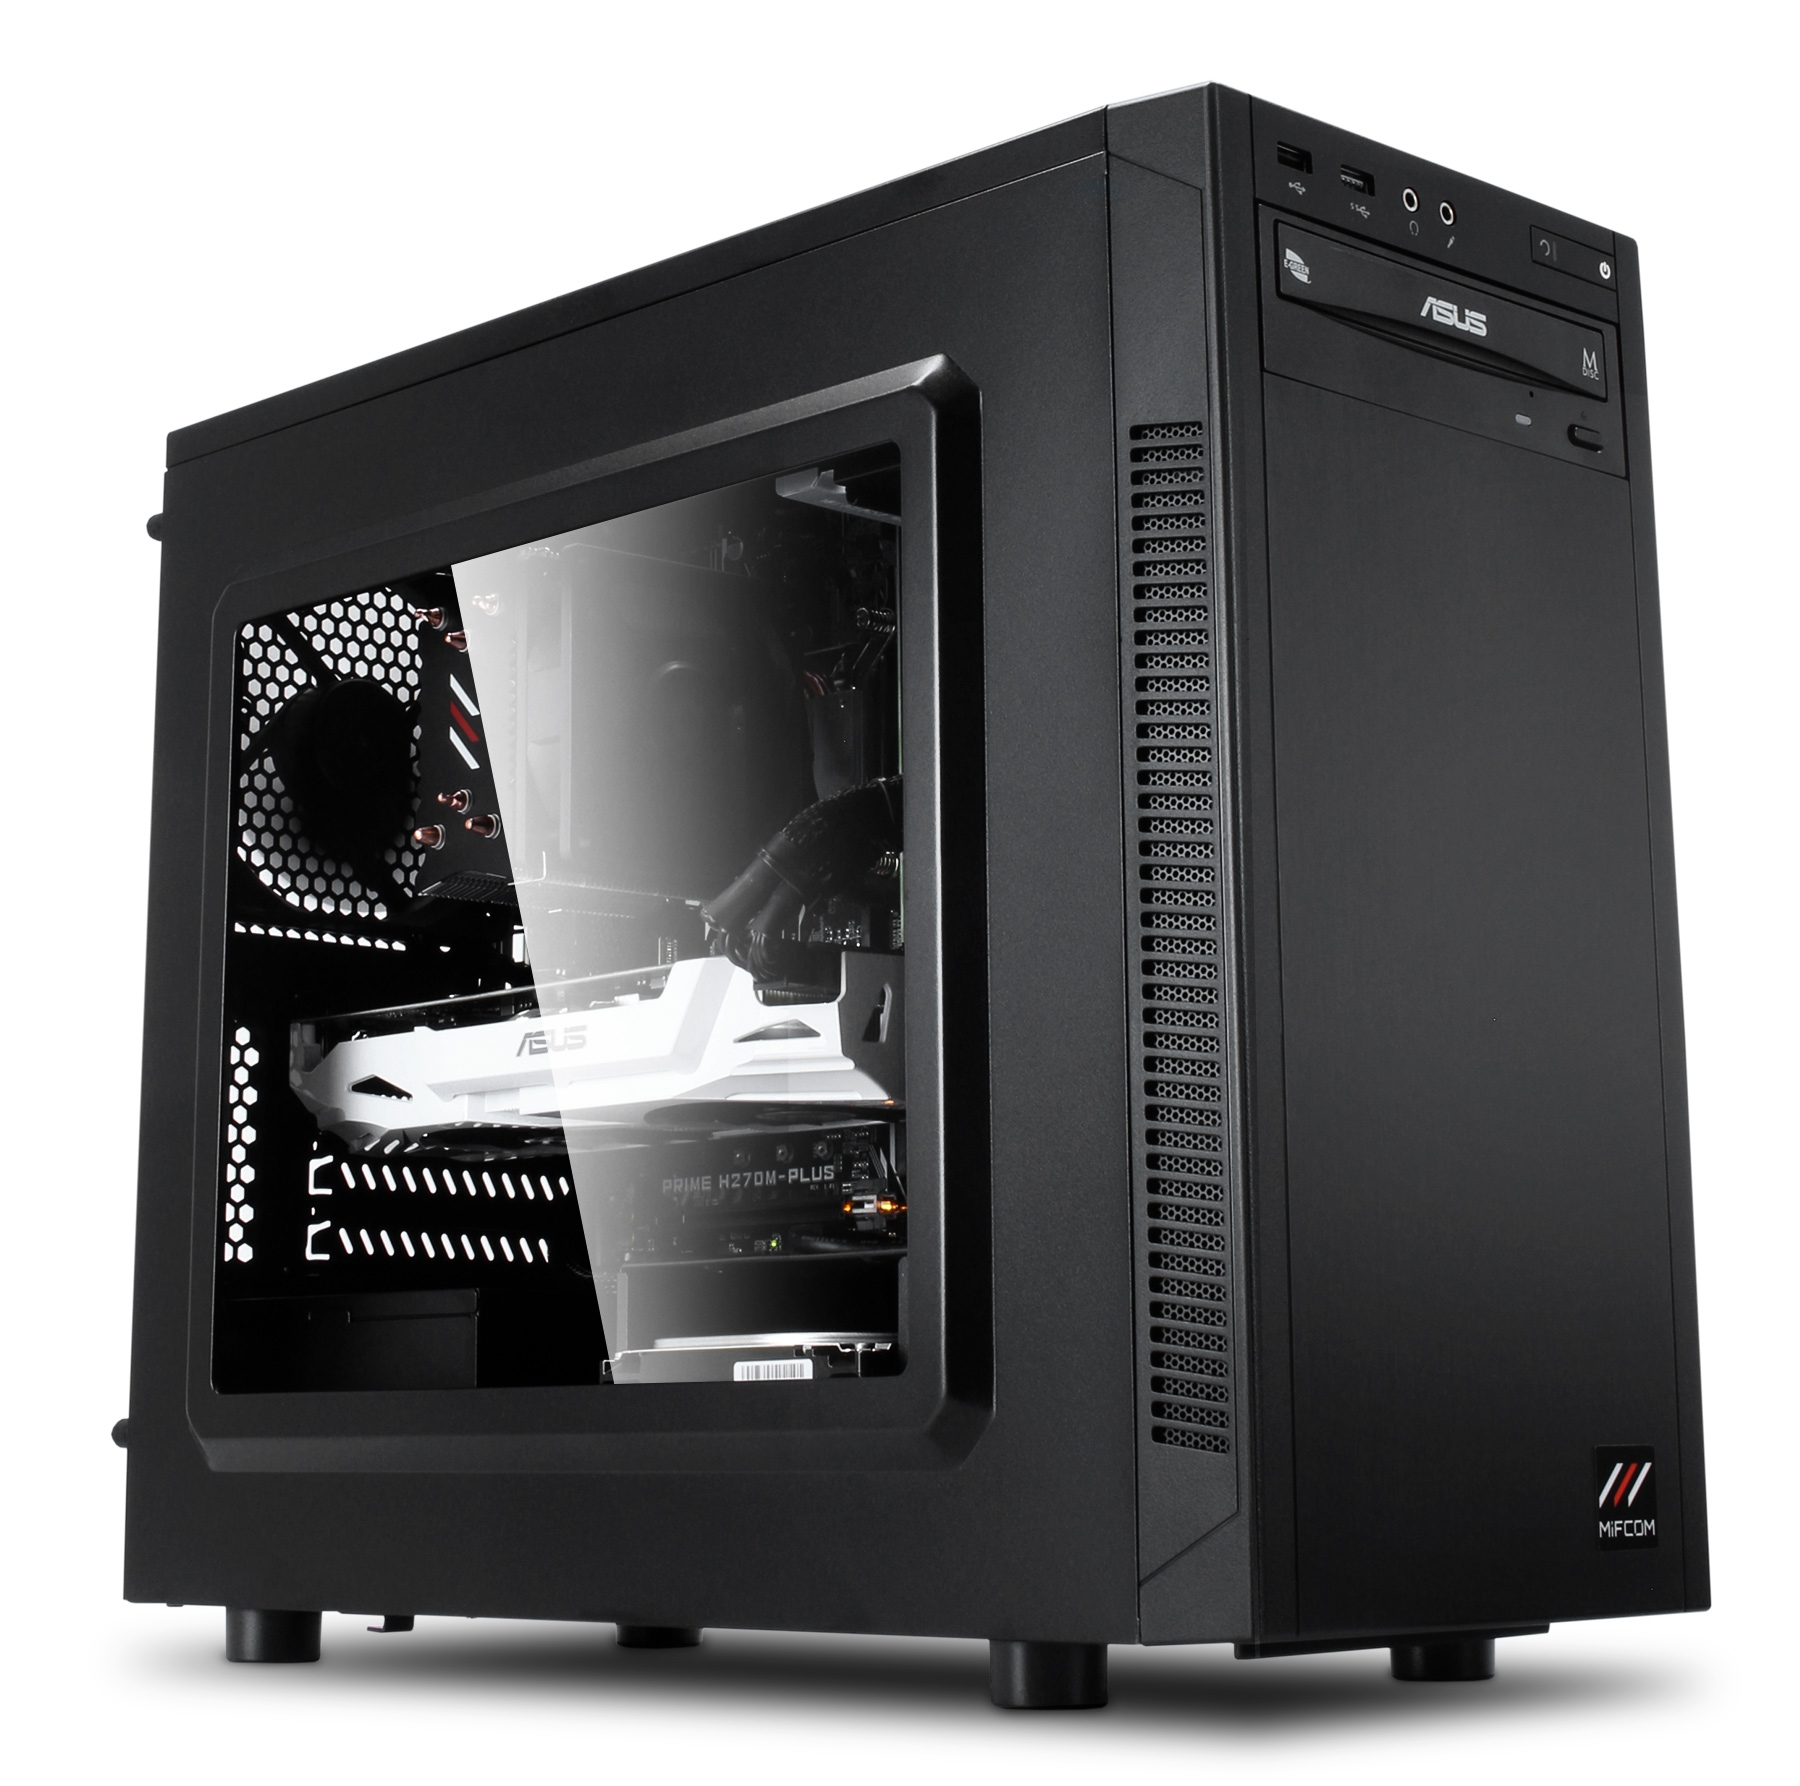 gaming mini pc core i7 7700 gtx 1070 gaming mini tower pc. Black Bedroom Furniture Sets. Home Design Ideas